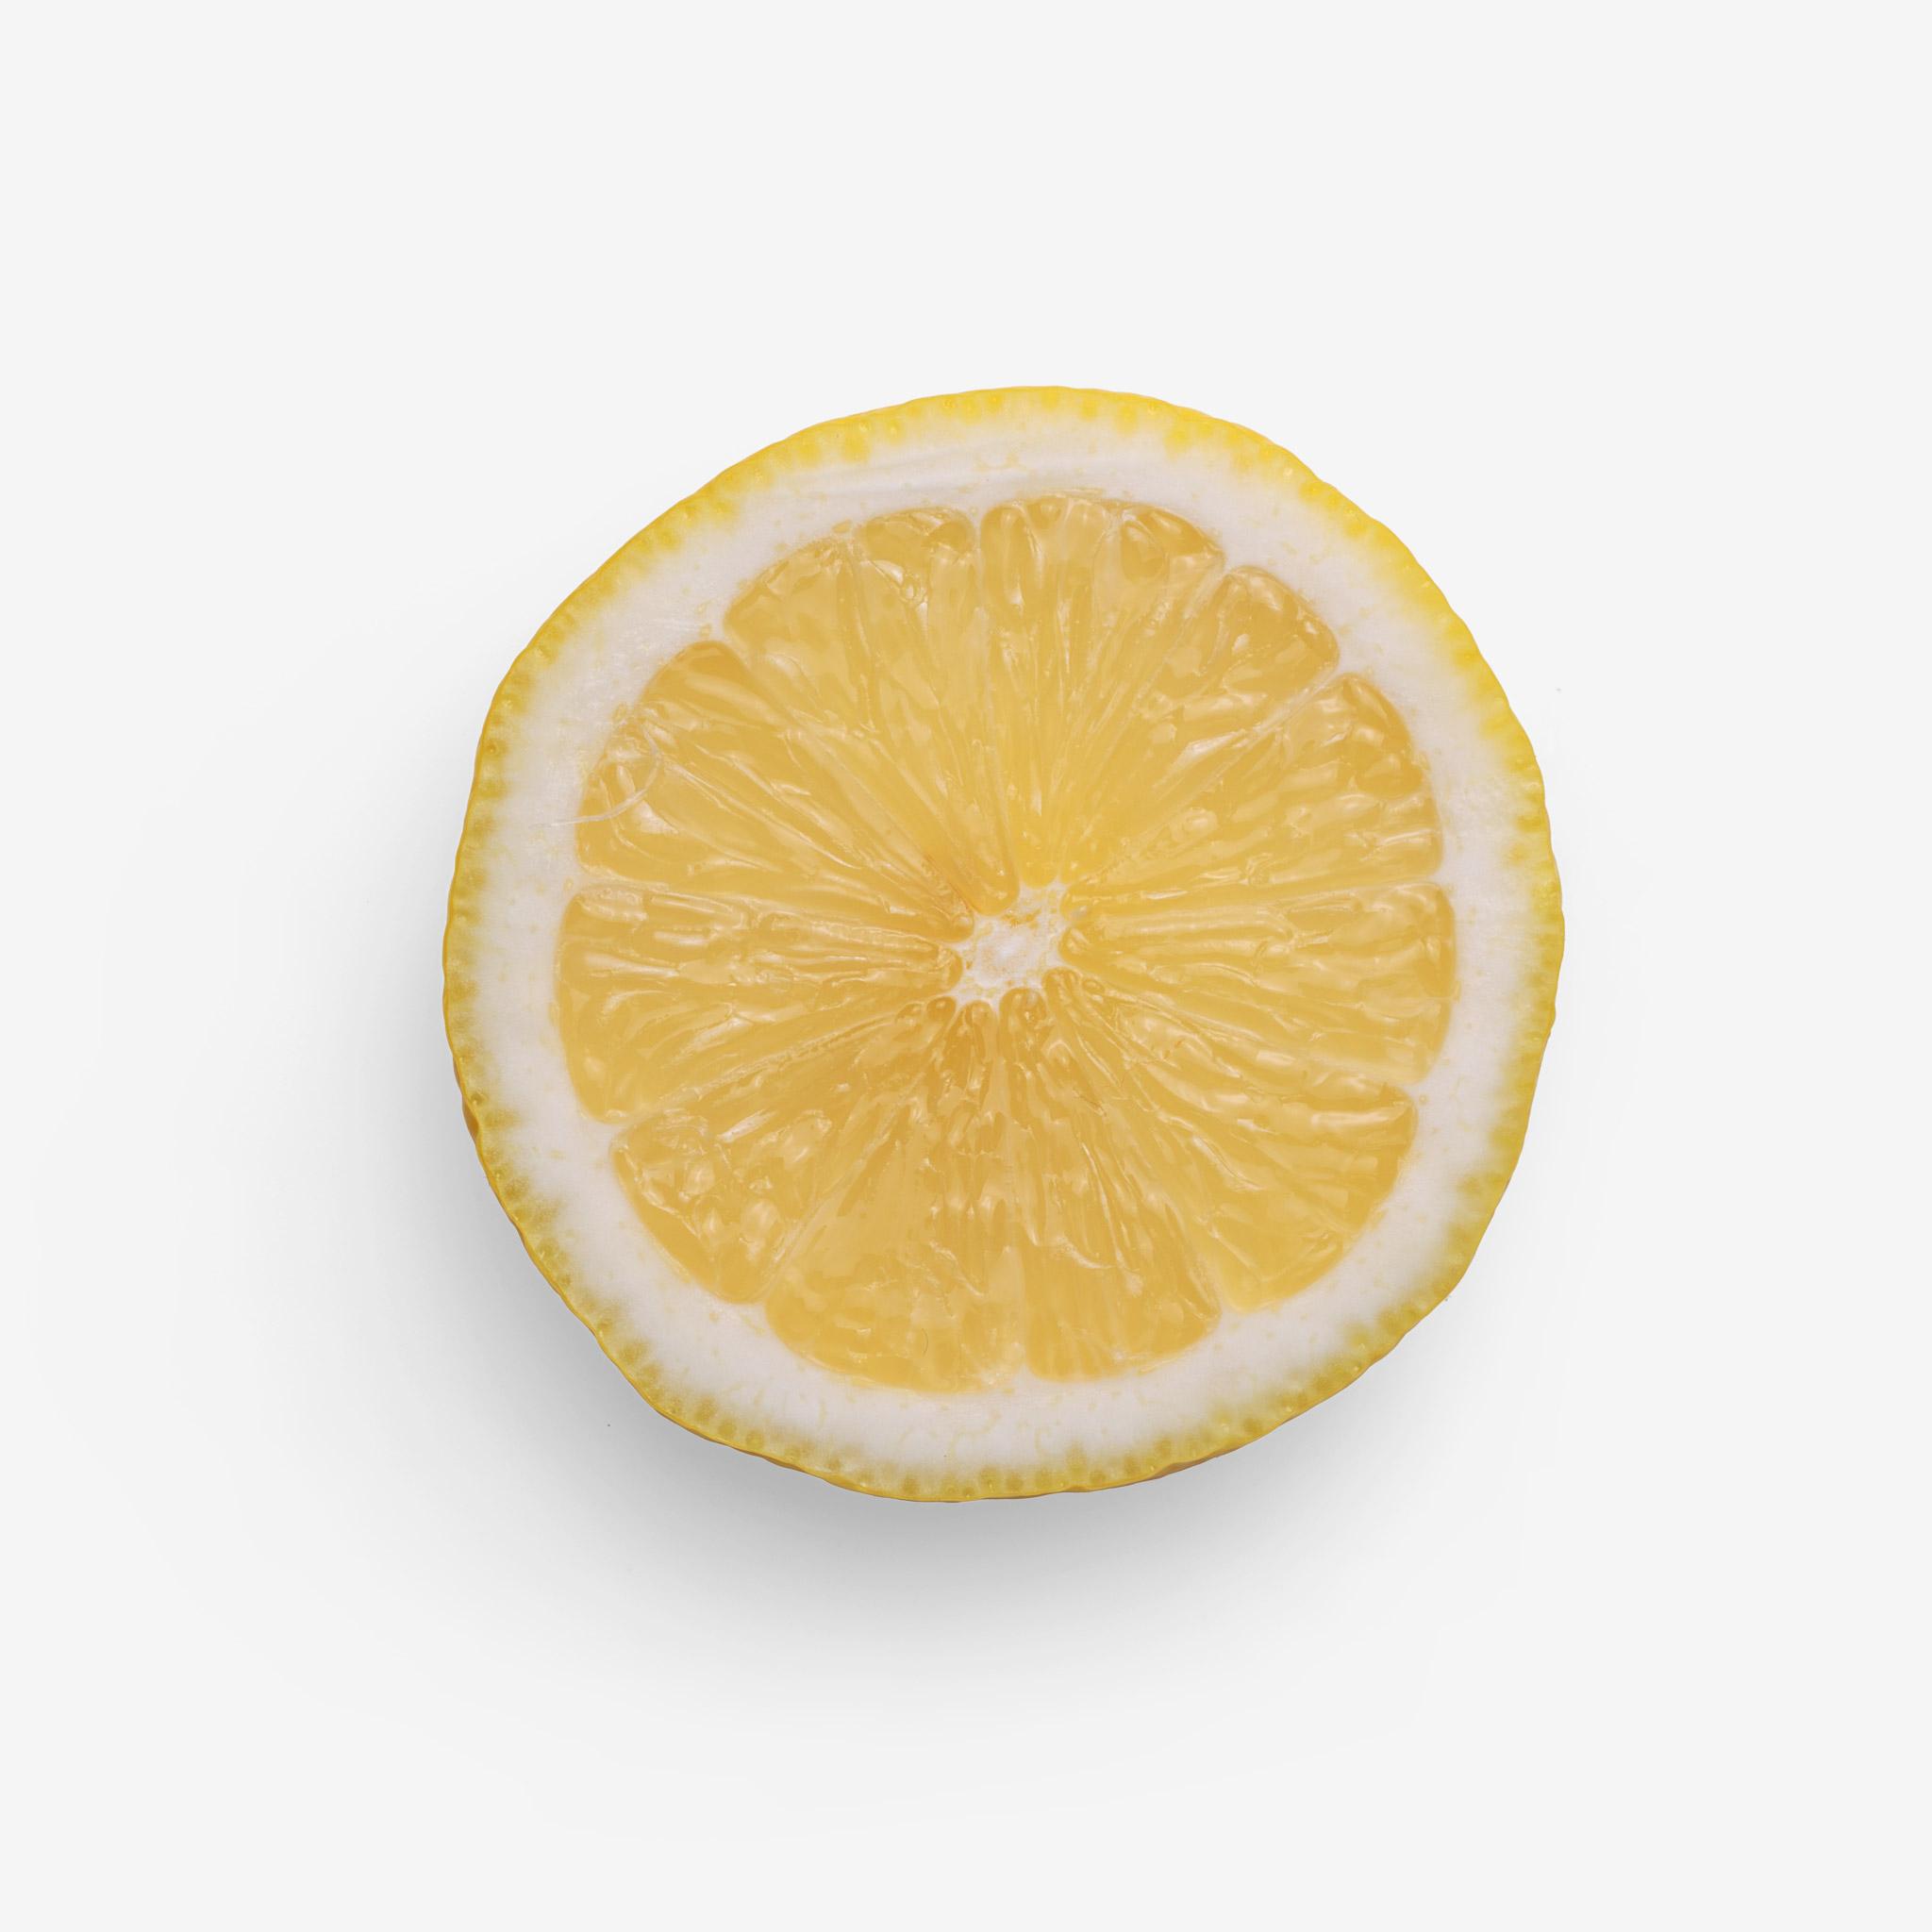 Lemon PSD layered image